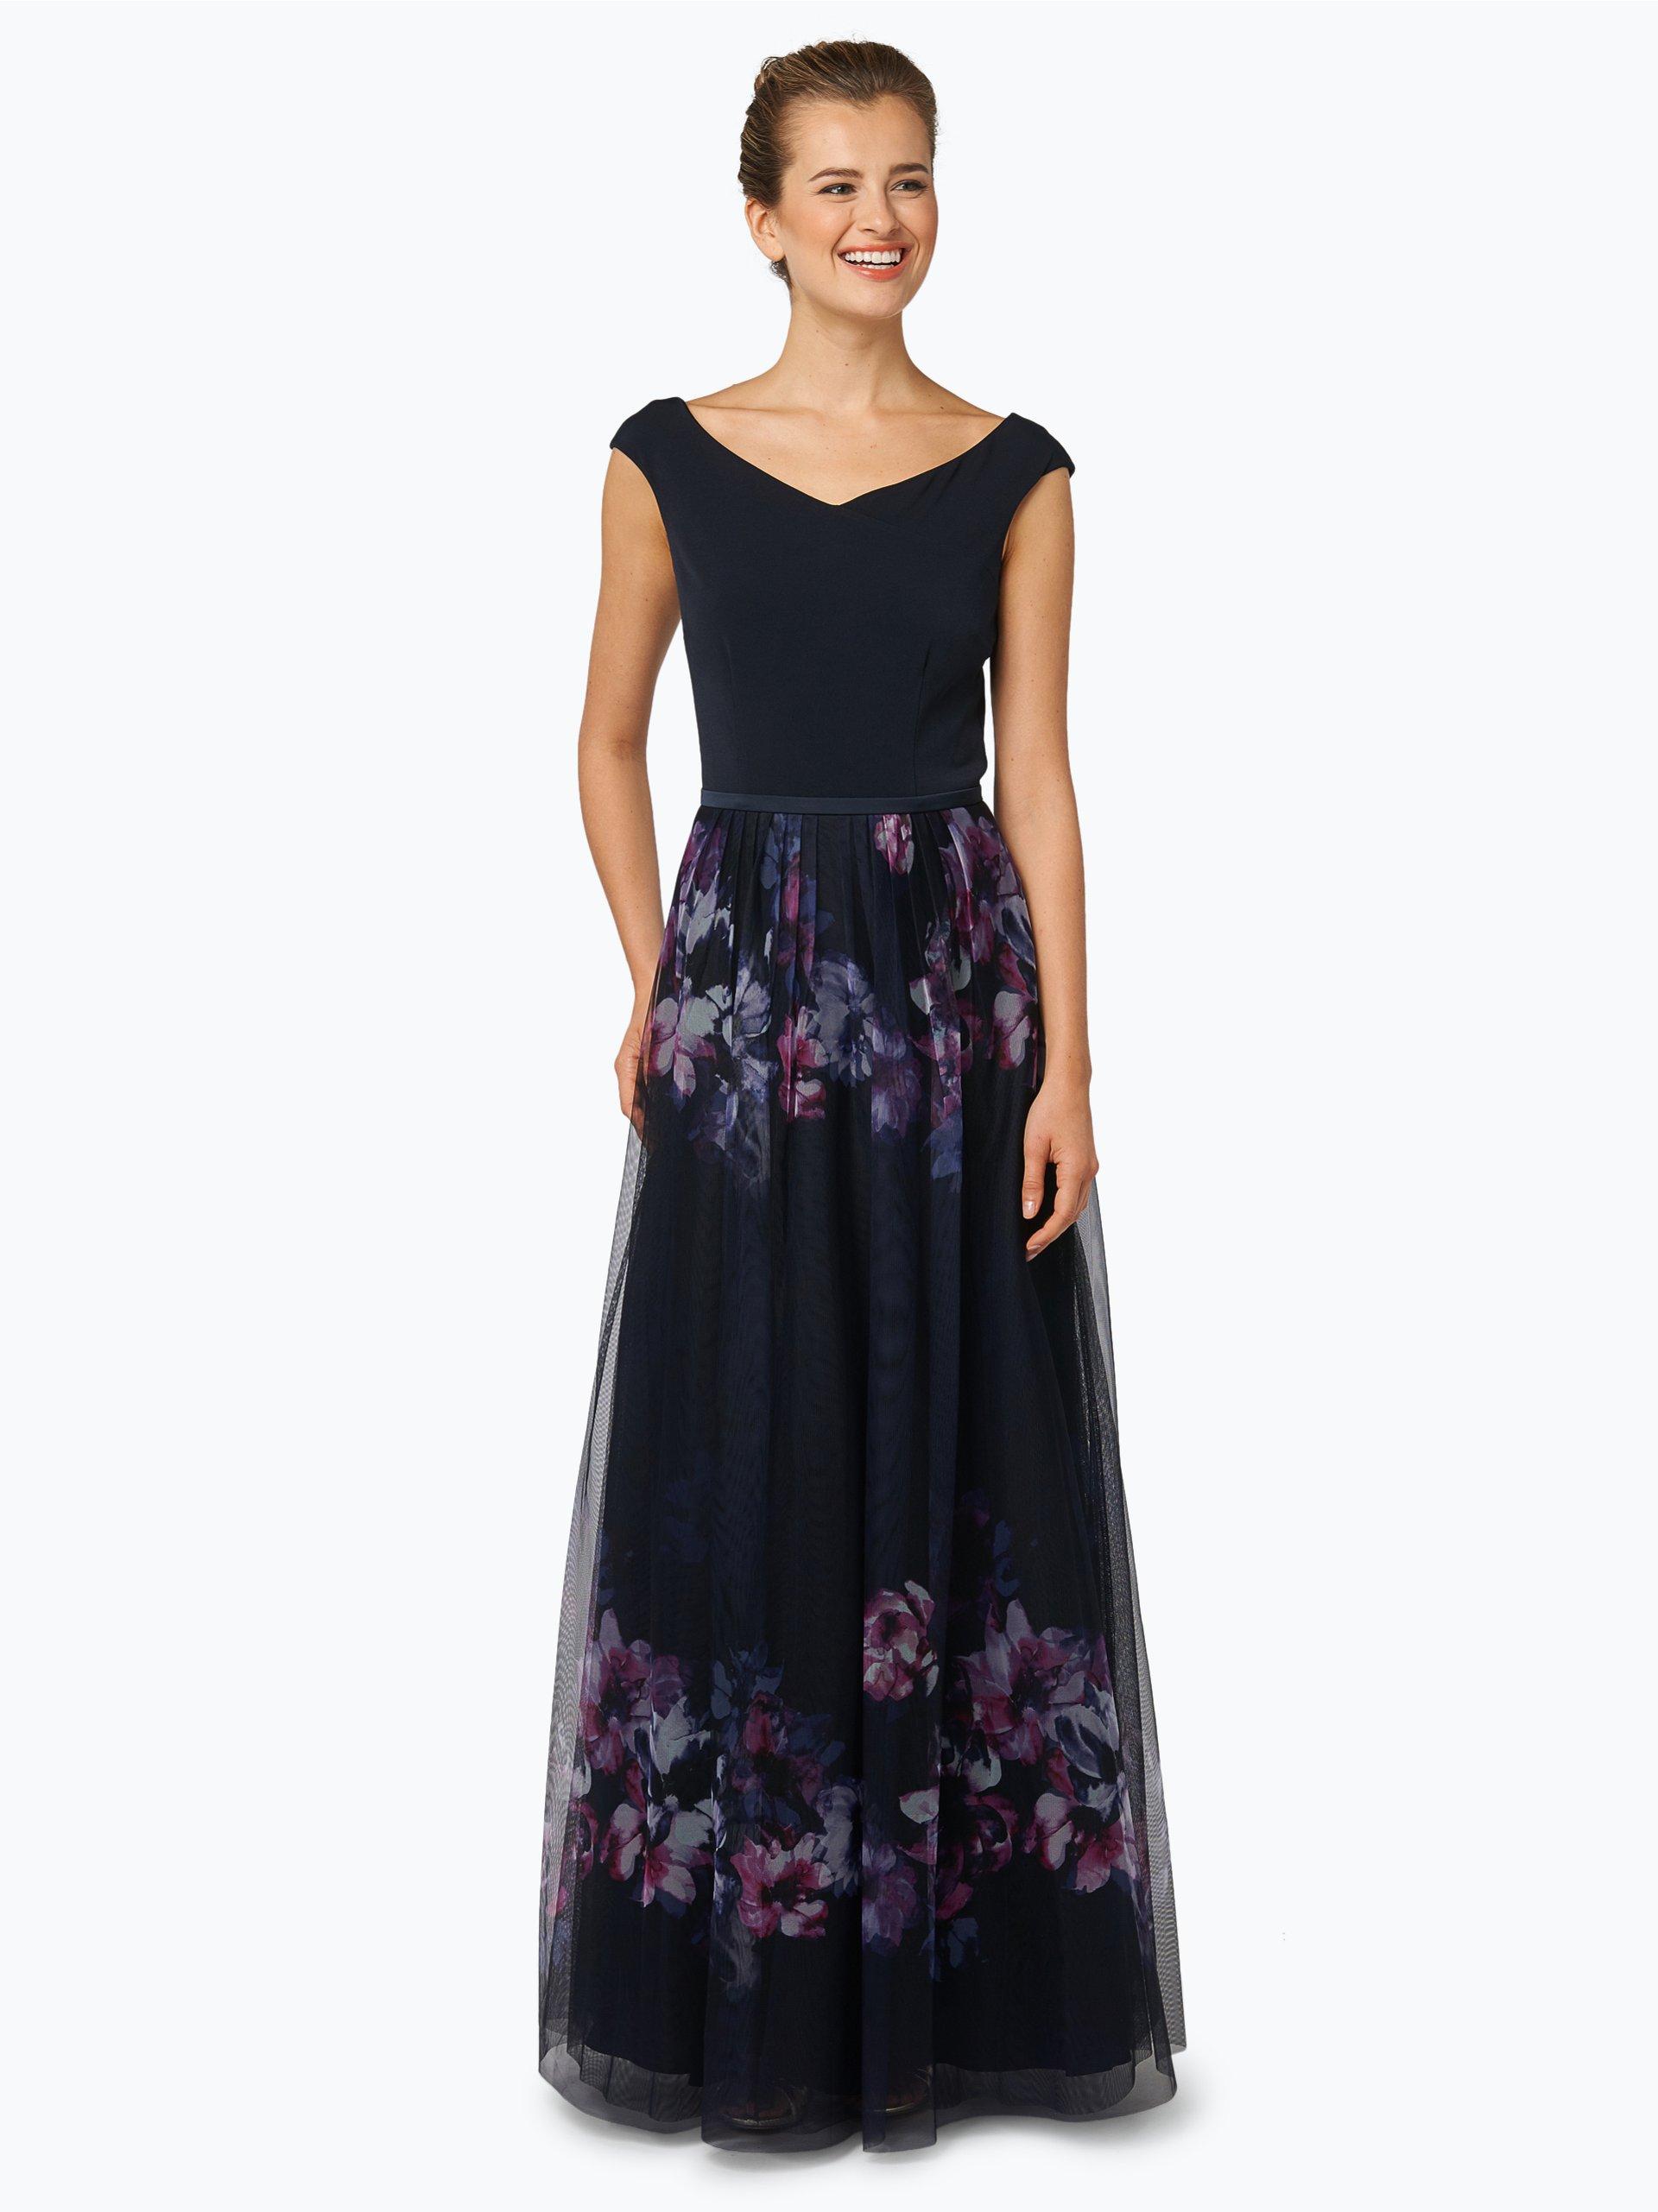 vera mont collection damska sukienka wieczorowa kup online. Black Bedroom Furniture Sets. Home Design Ideas